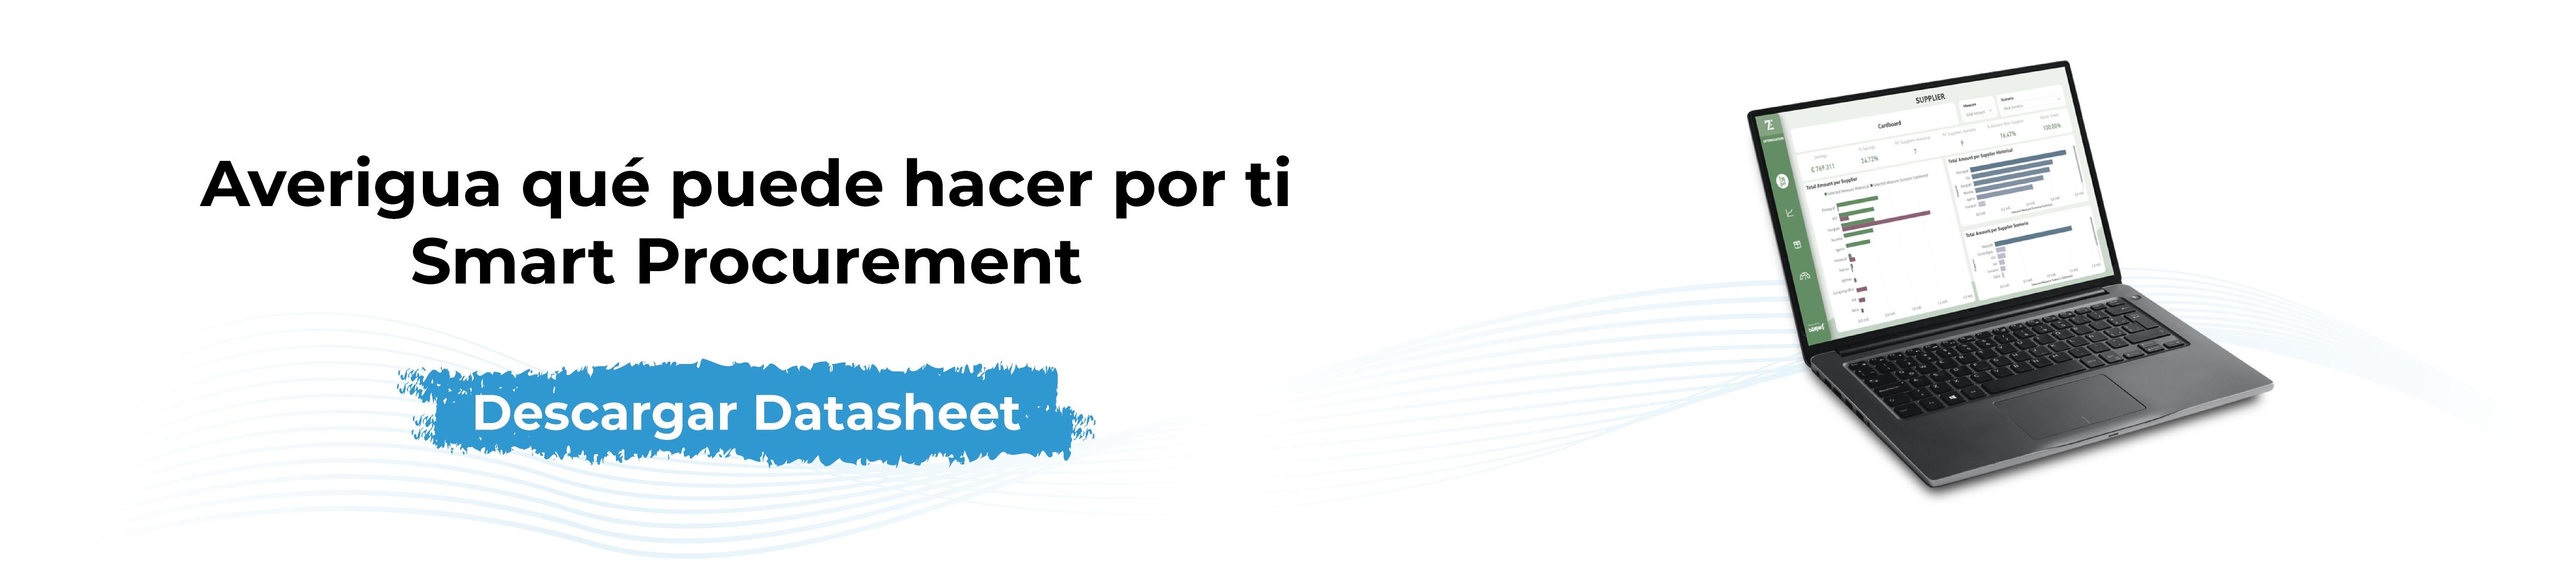 smart-procurement-cta